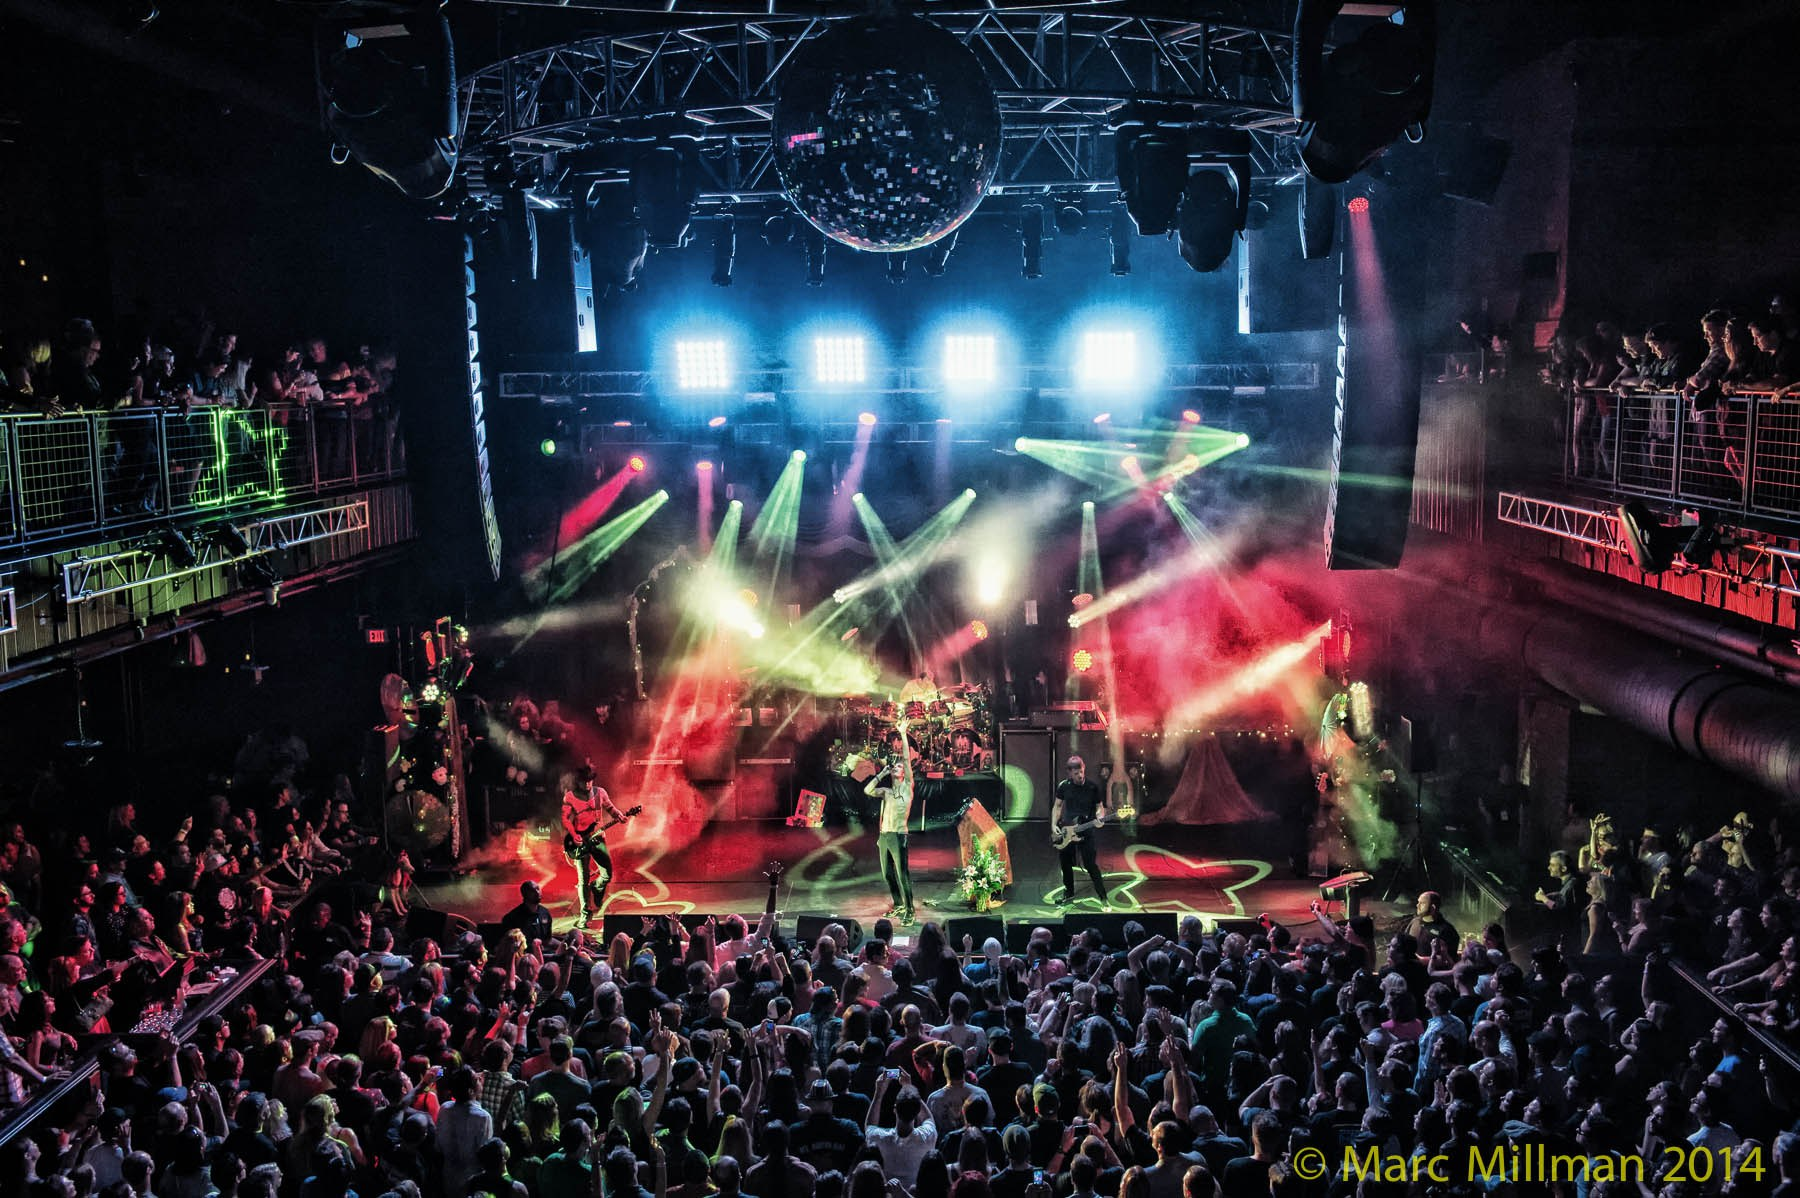 Janes-Addiction-Brooklyn-Bowl-Vegas-Thur-5-8-14_May-08-20120543-Edit-Edit.jpg